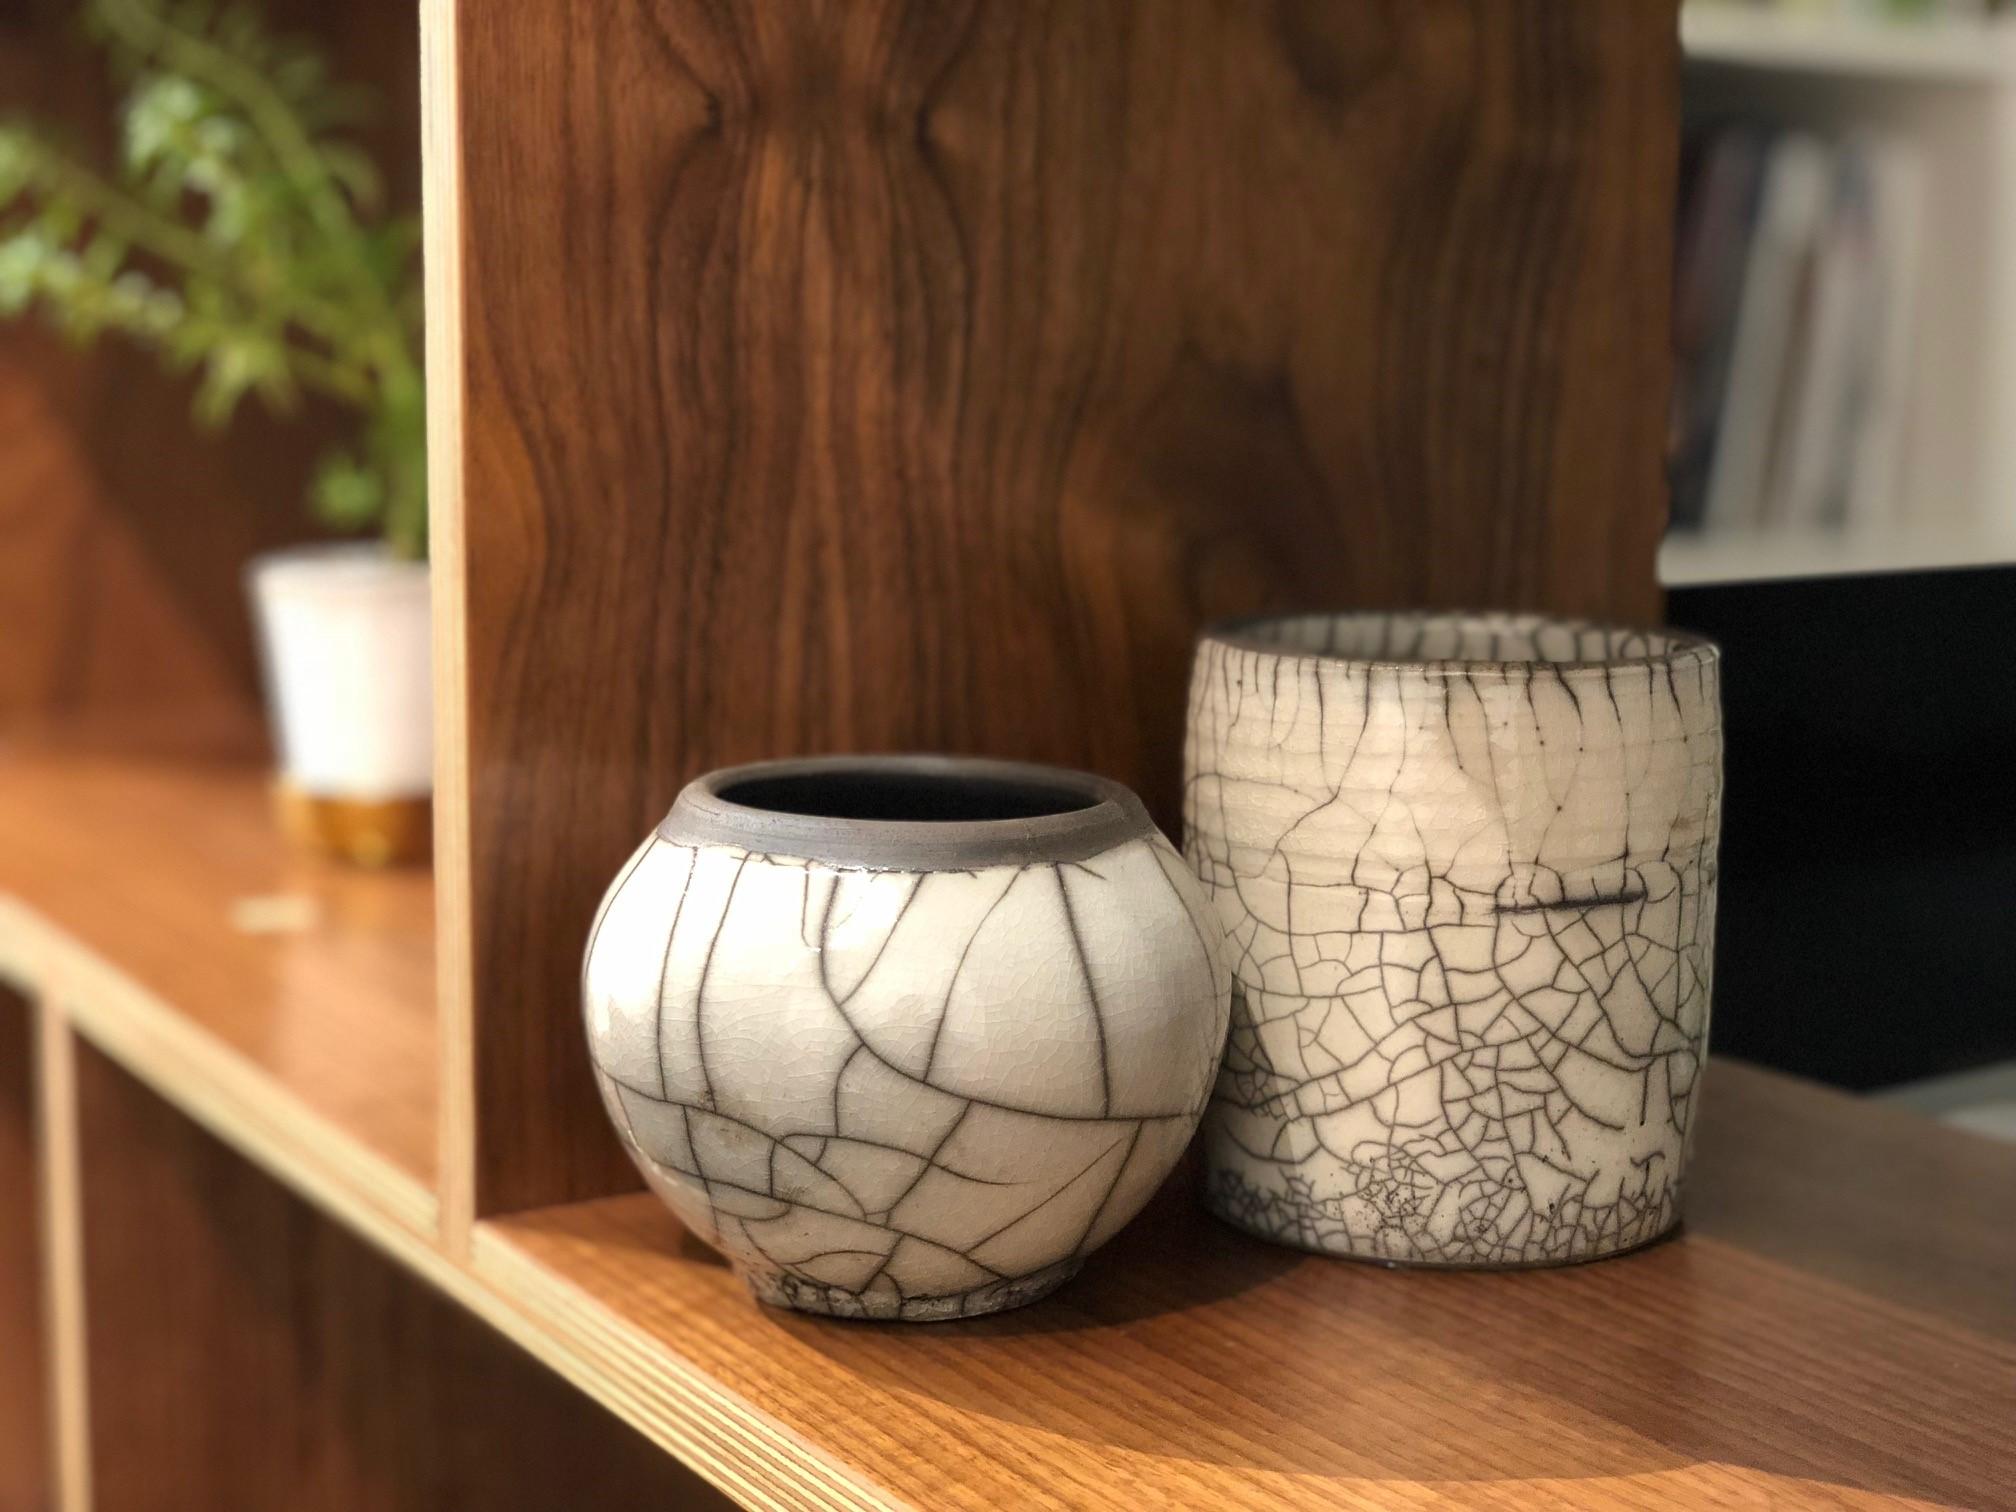 pottery3.jpg